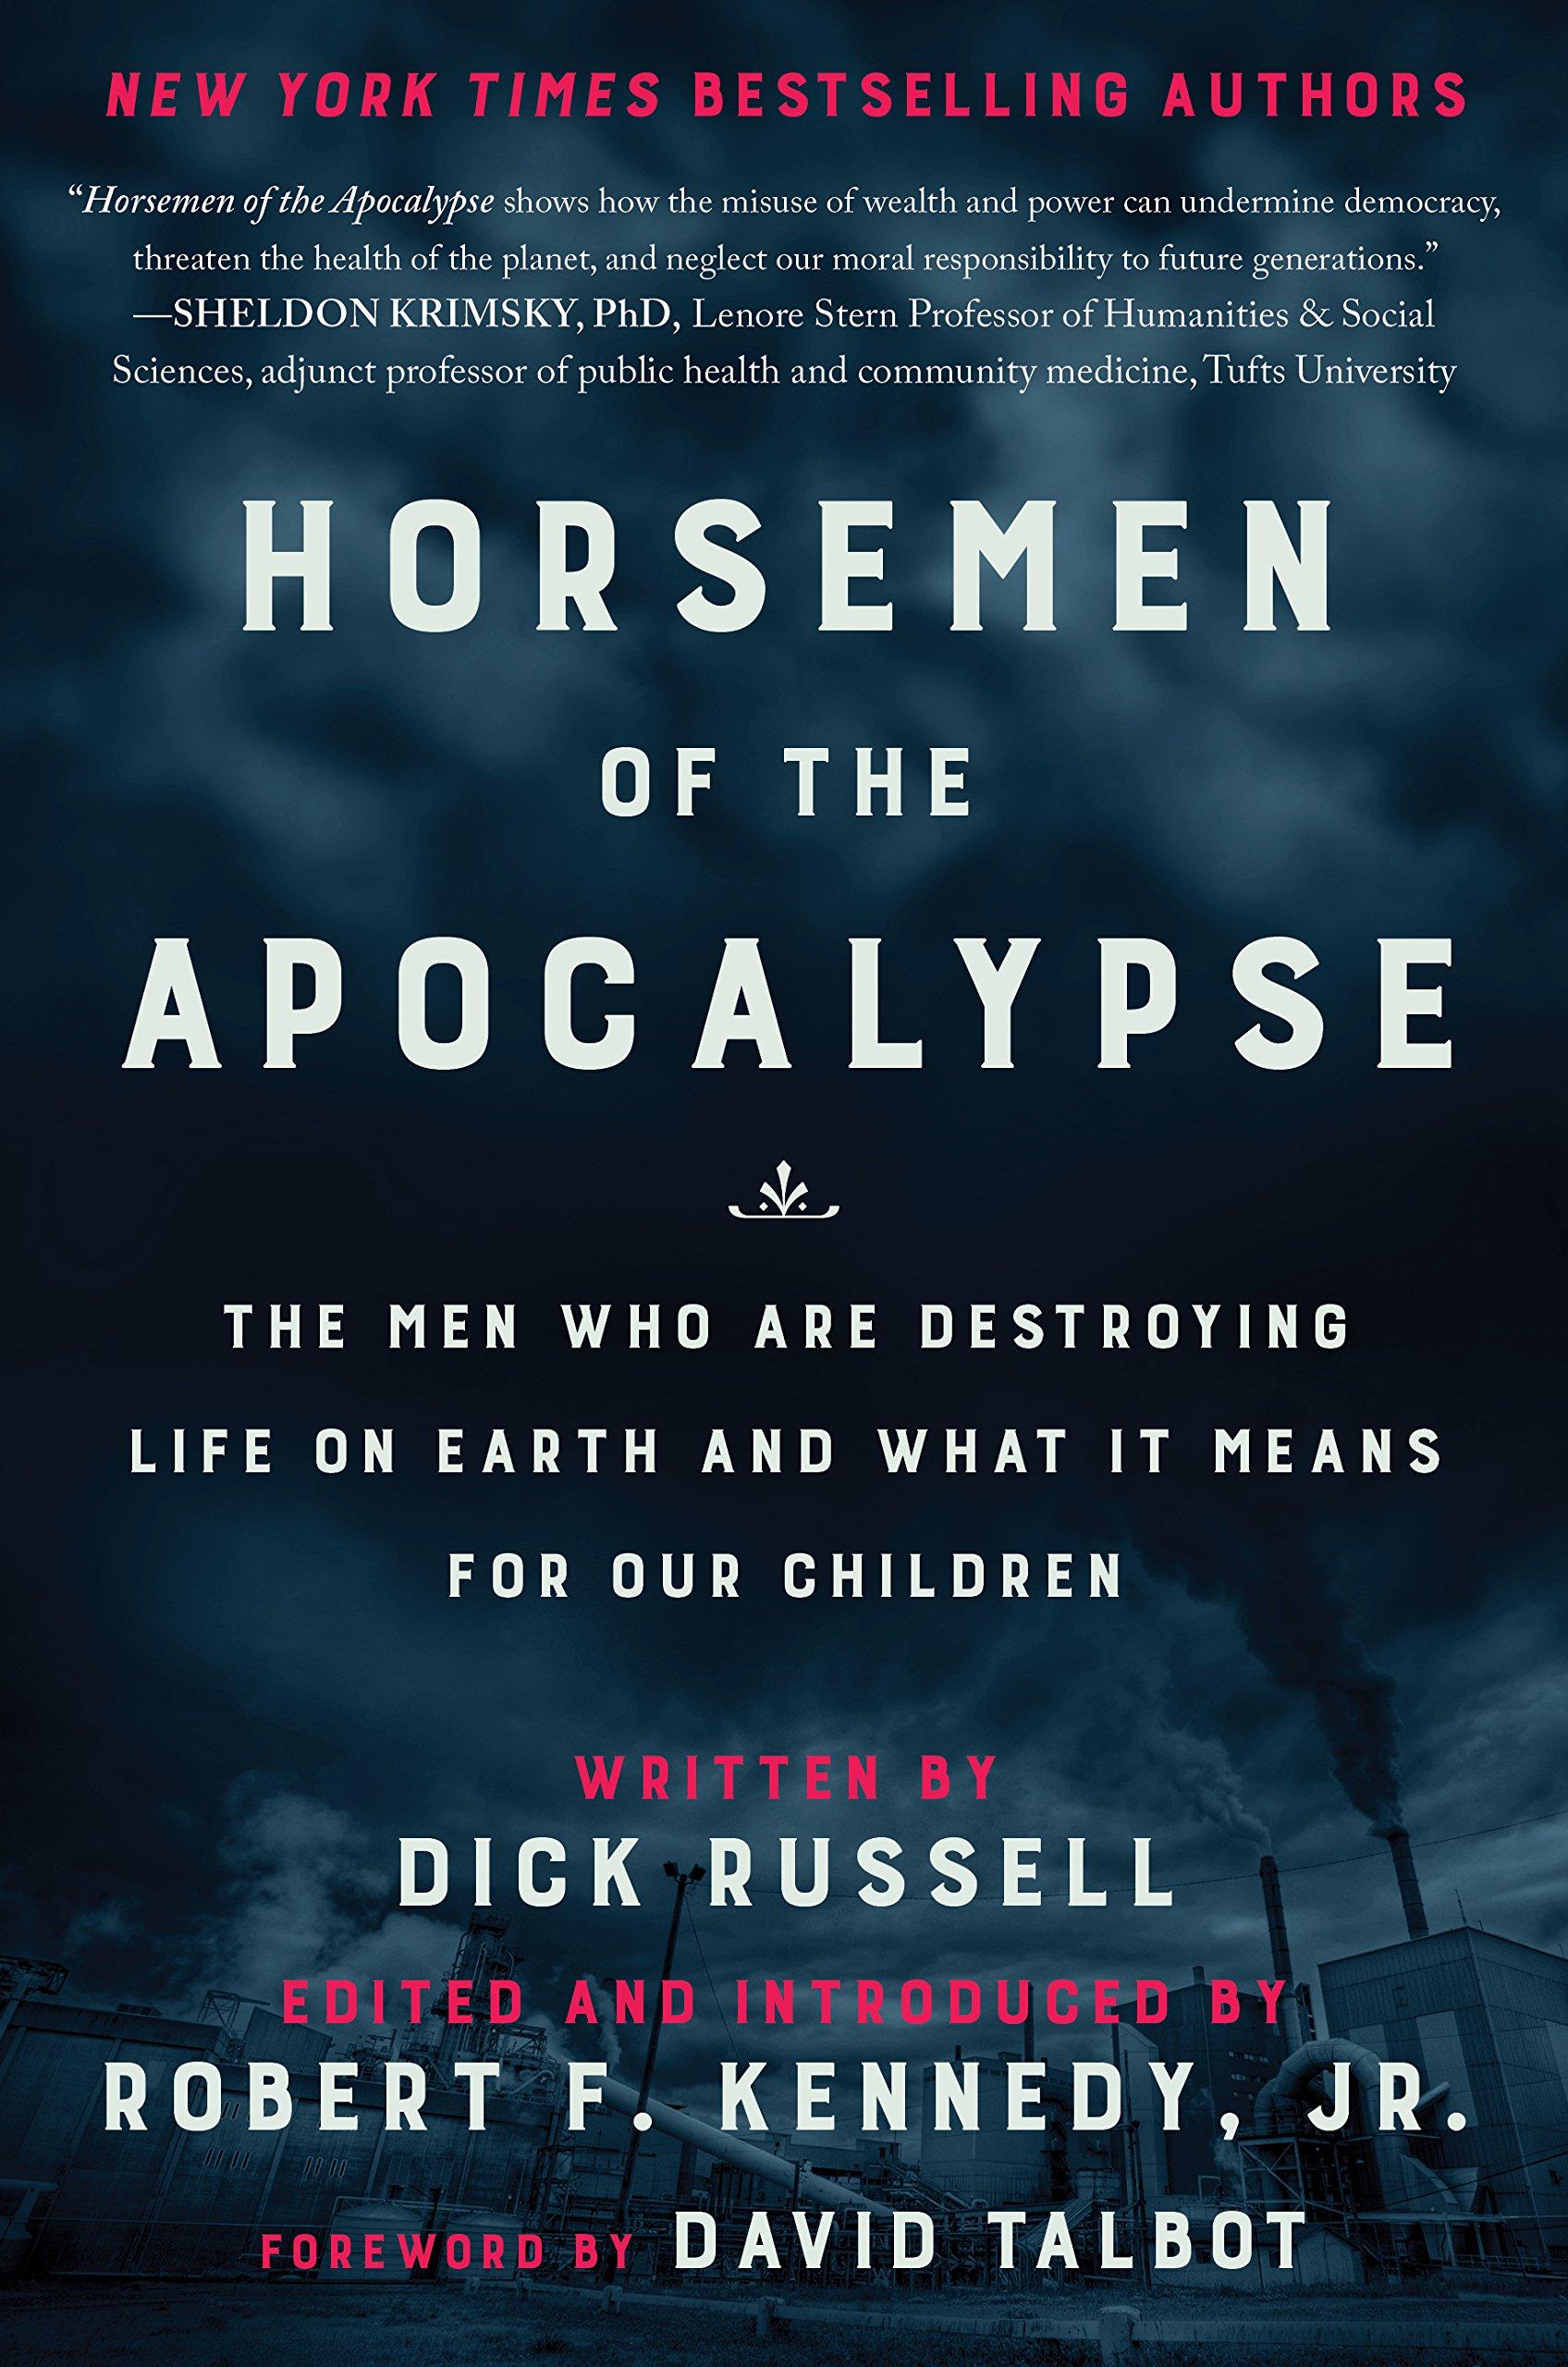 Horsemen Apocalypse Destroying Earth And Children product image